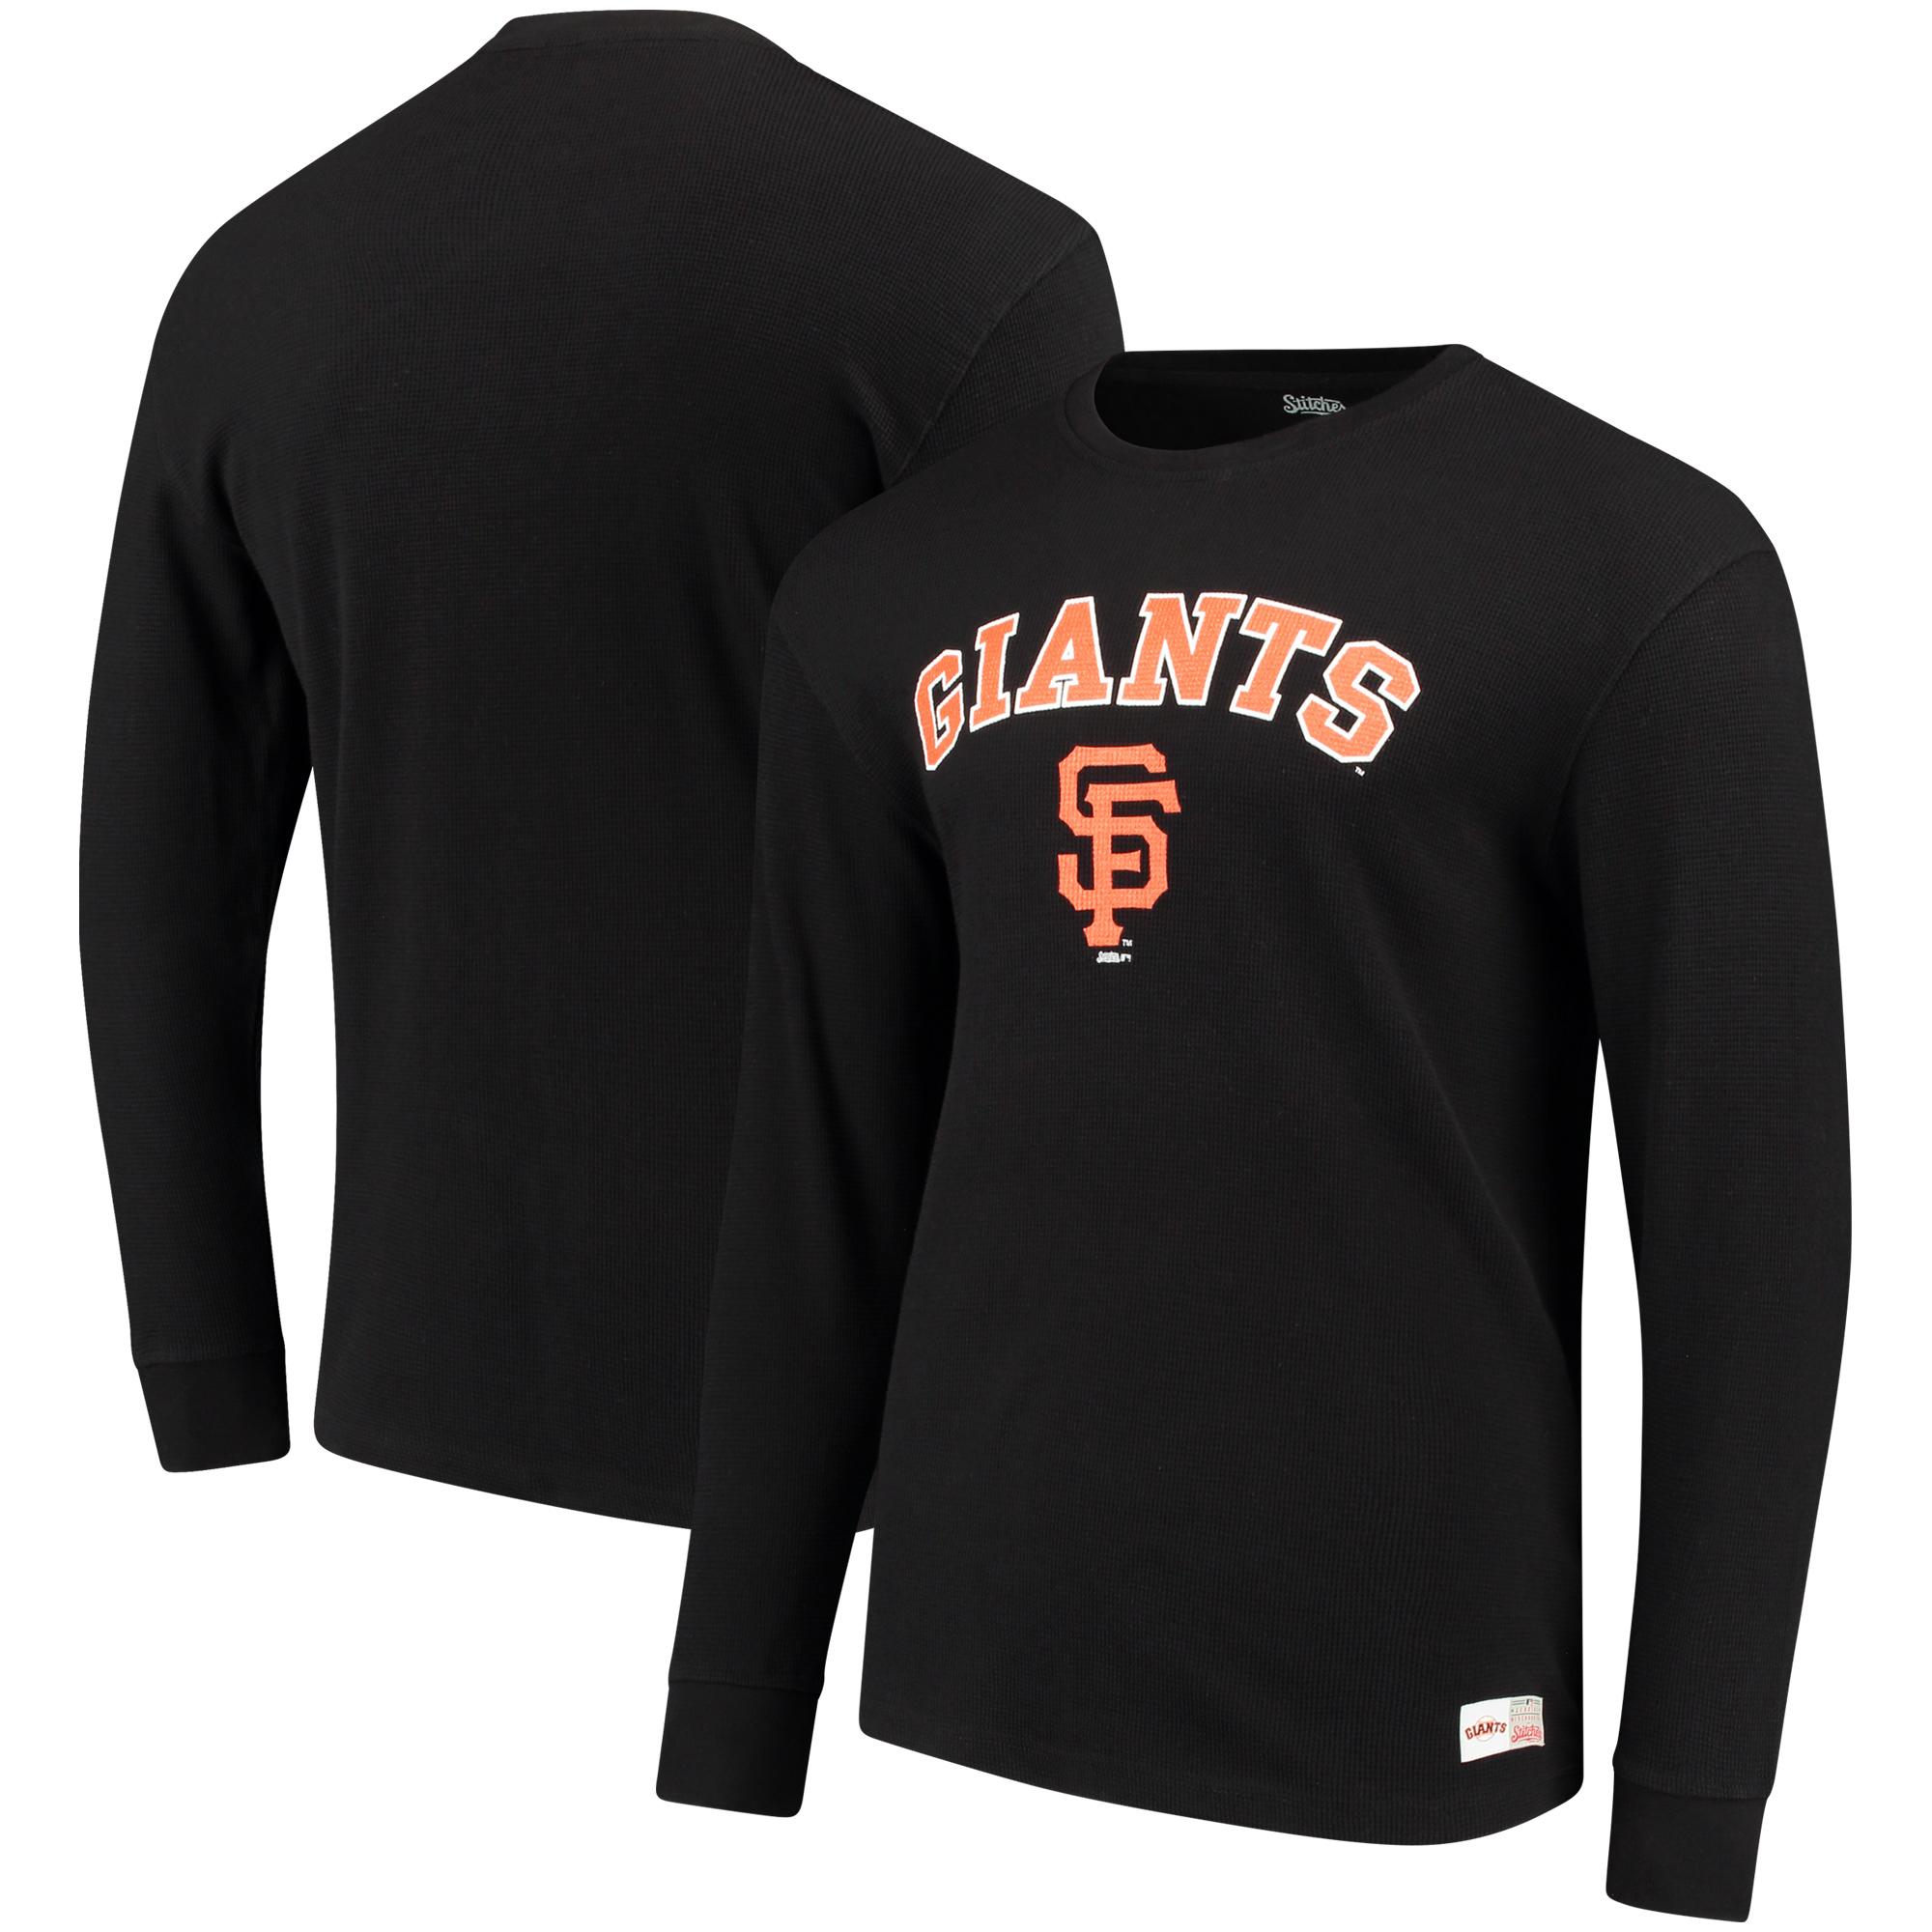 San Francisco Giants Stitches Long Sleeve Thermal T-Shirt - Black